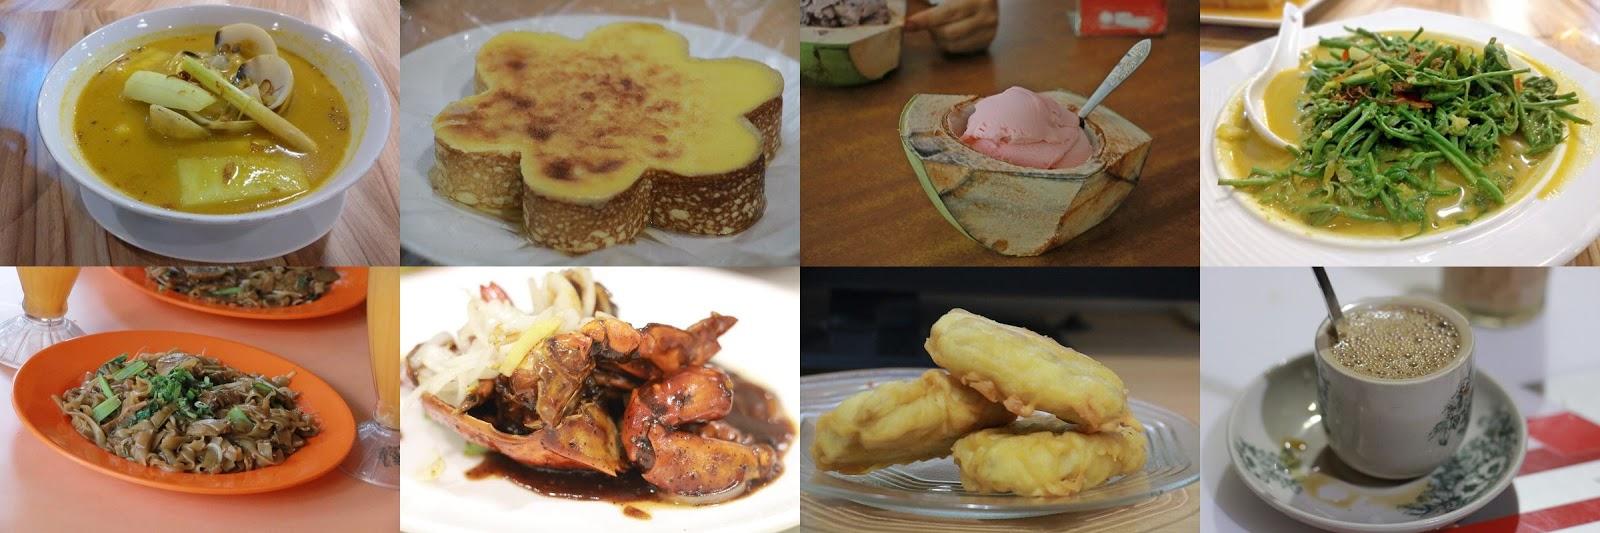 Tempat Wisata Kuliner Khas Dan Legendaris Di Kota Pontianak Tᖇᗩᐯeᒪeᖇieᑎ